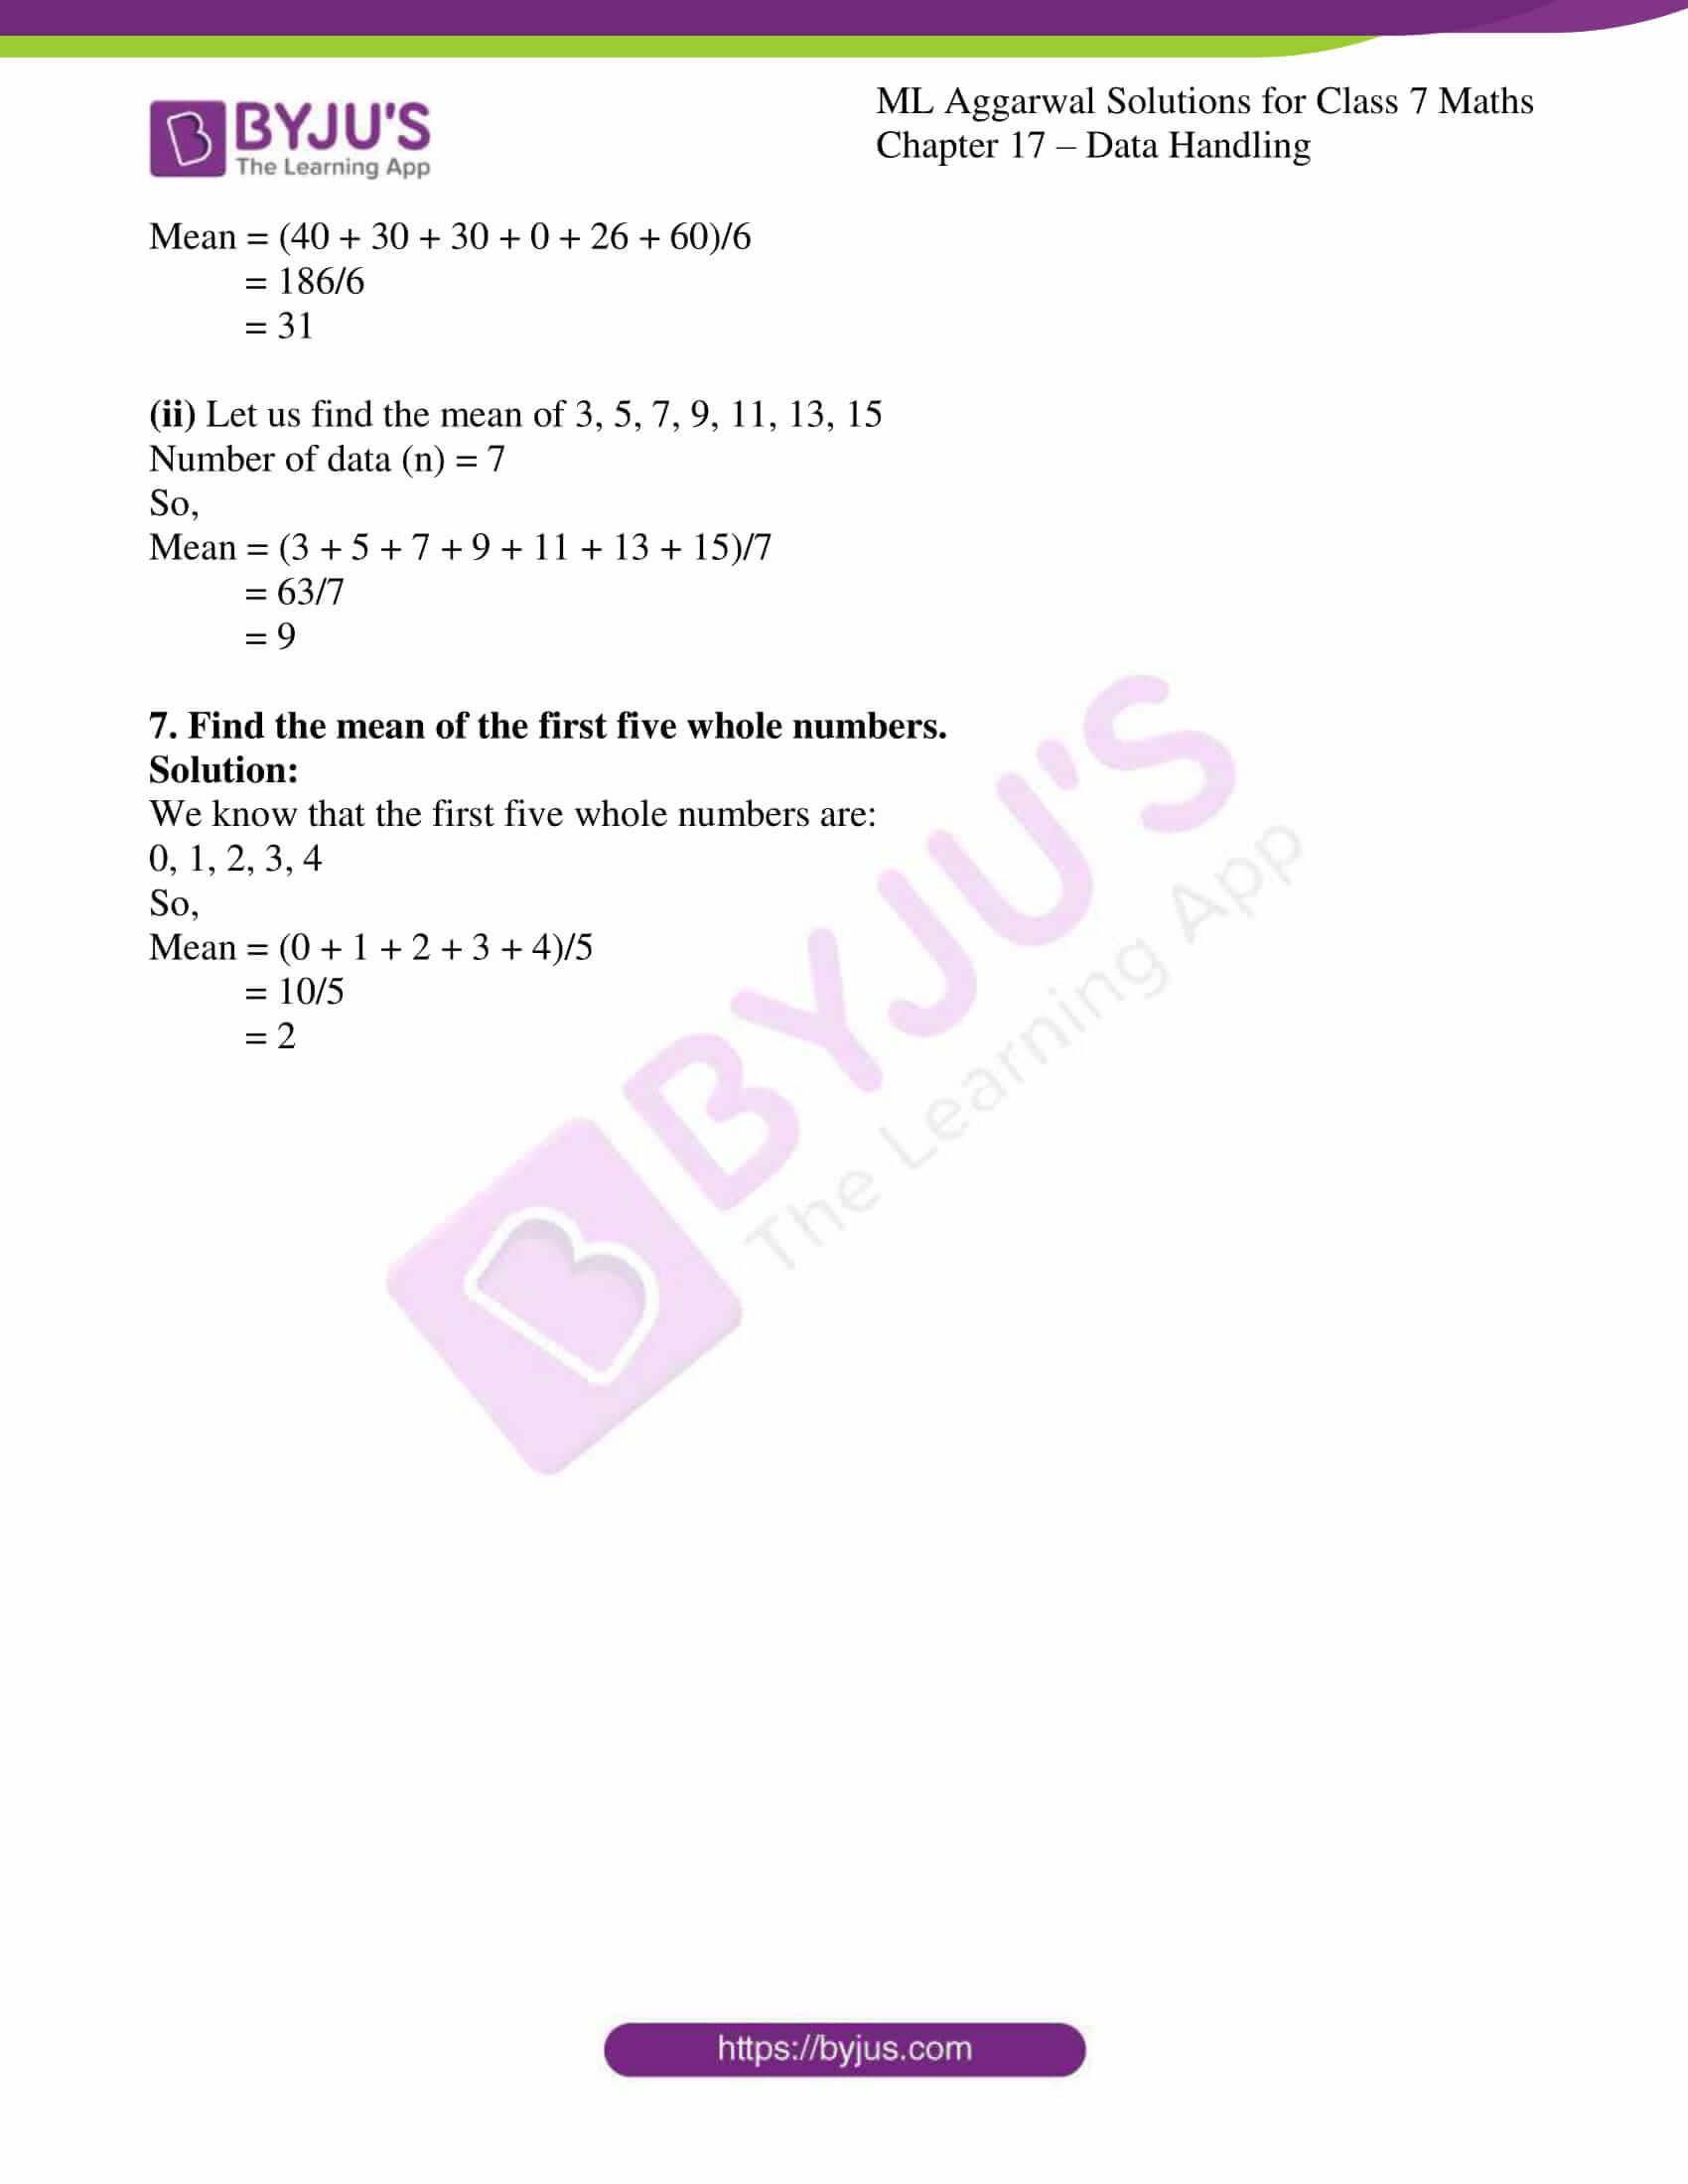 ml aggarwal sol class 7 maths chapter 17 7